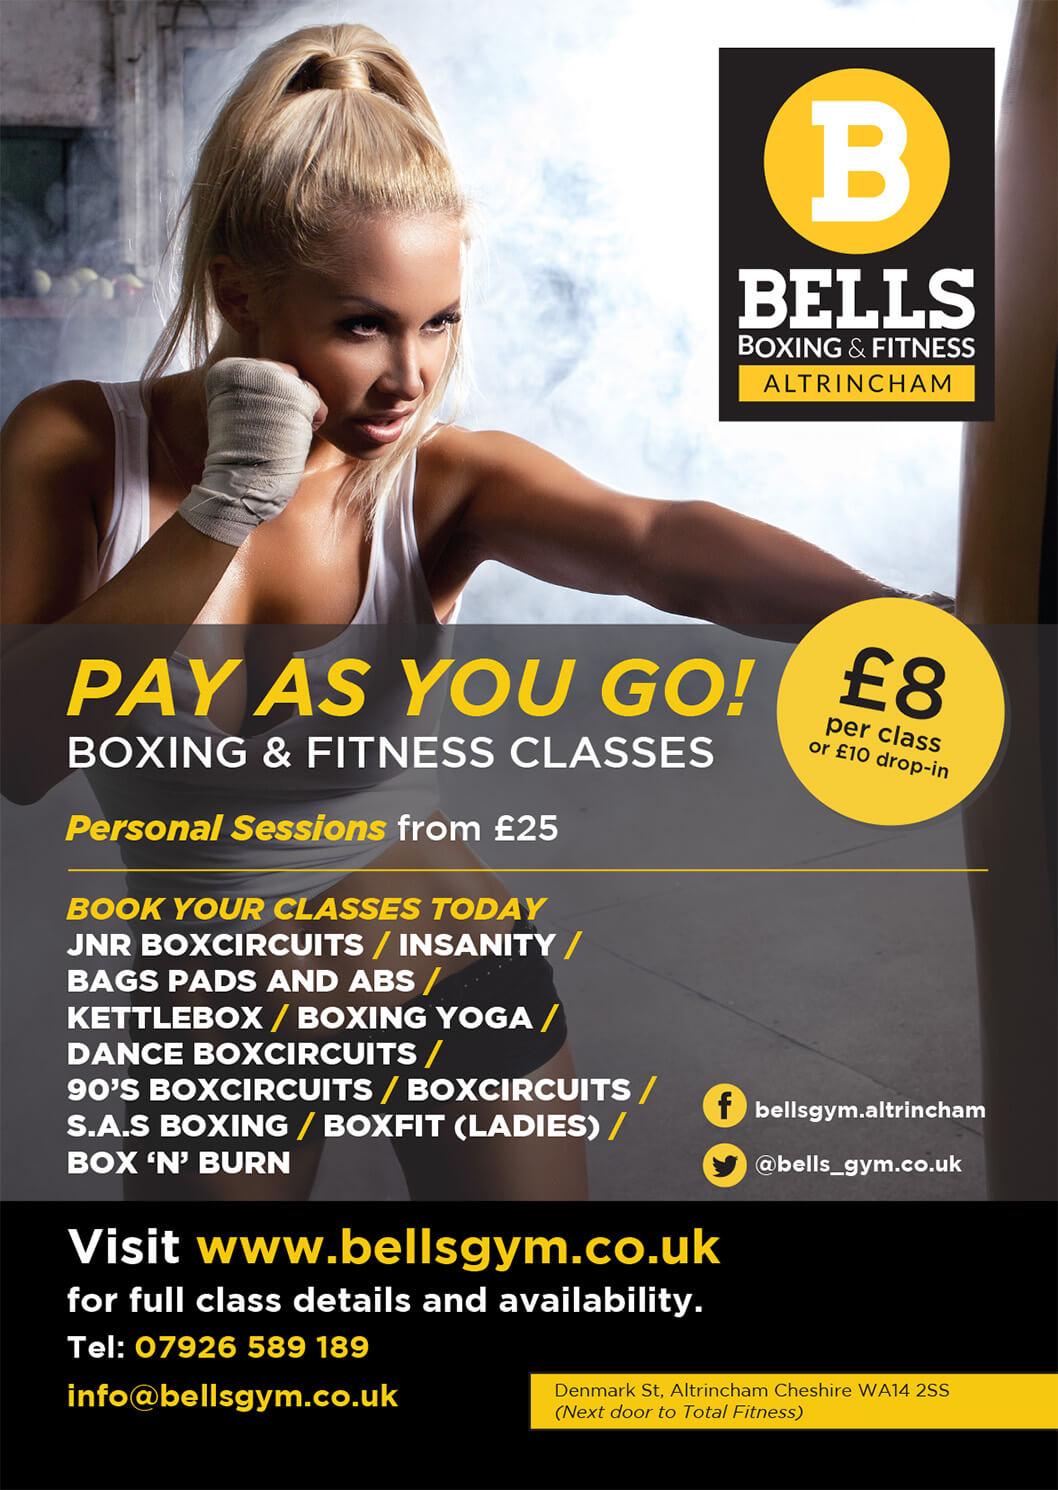 A3 Bells Gym Poster